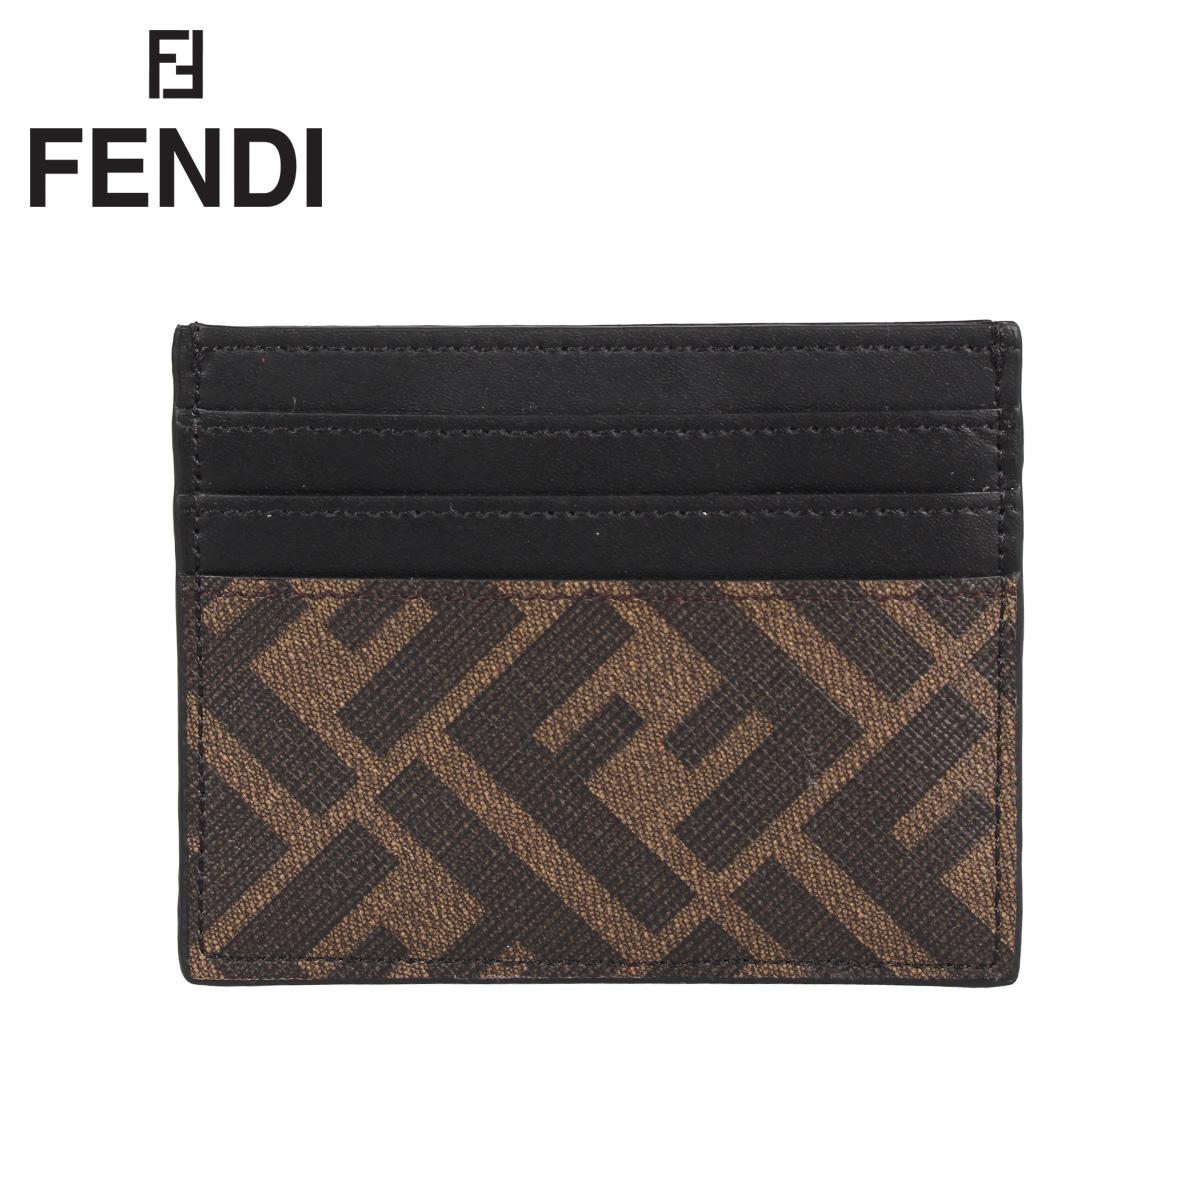 FENDI フェンディ パスケース カードケース ID 定期入れ メンズ PORTACARTE CLASSICO ブラウン 7M0164